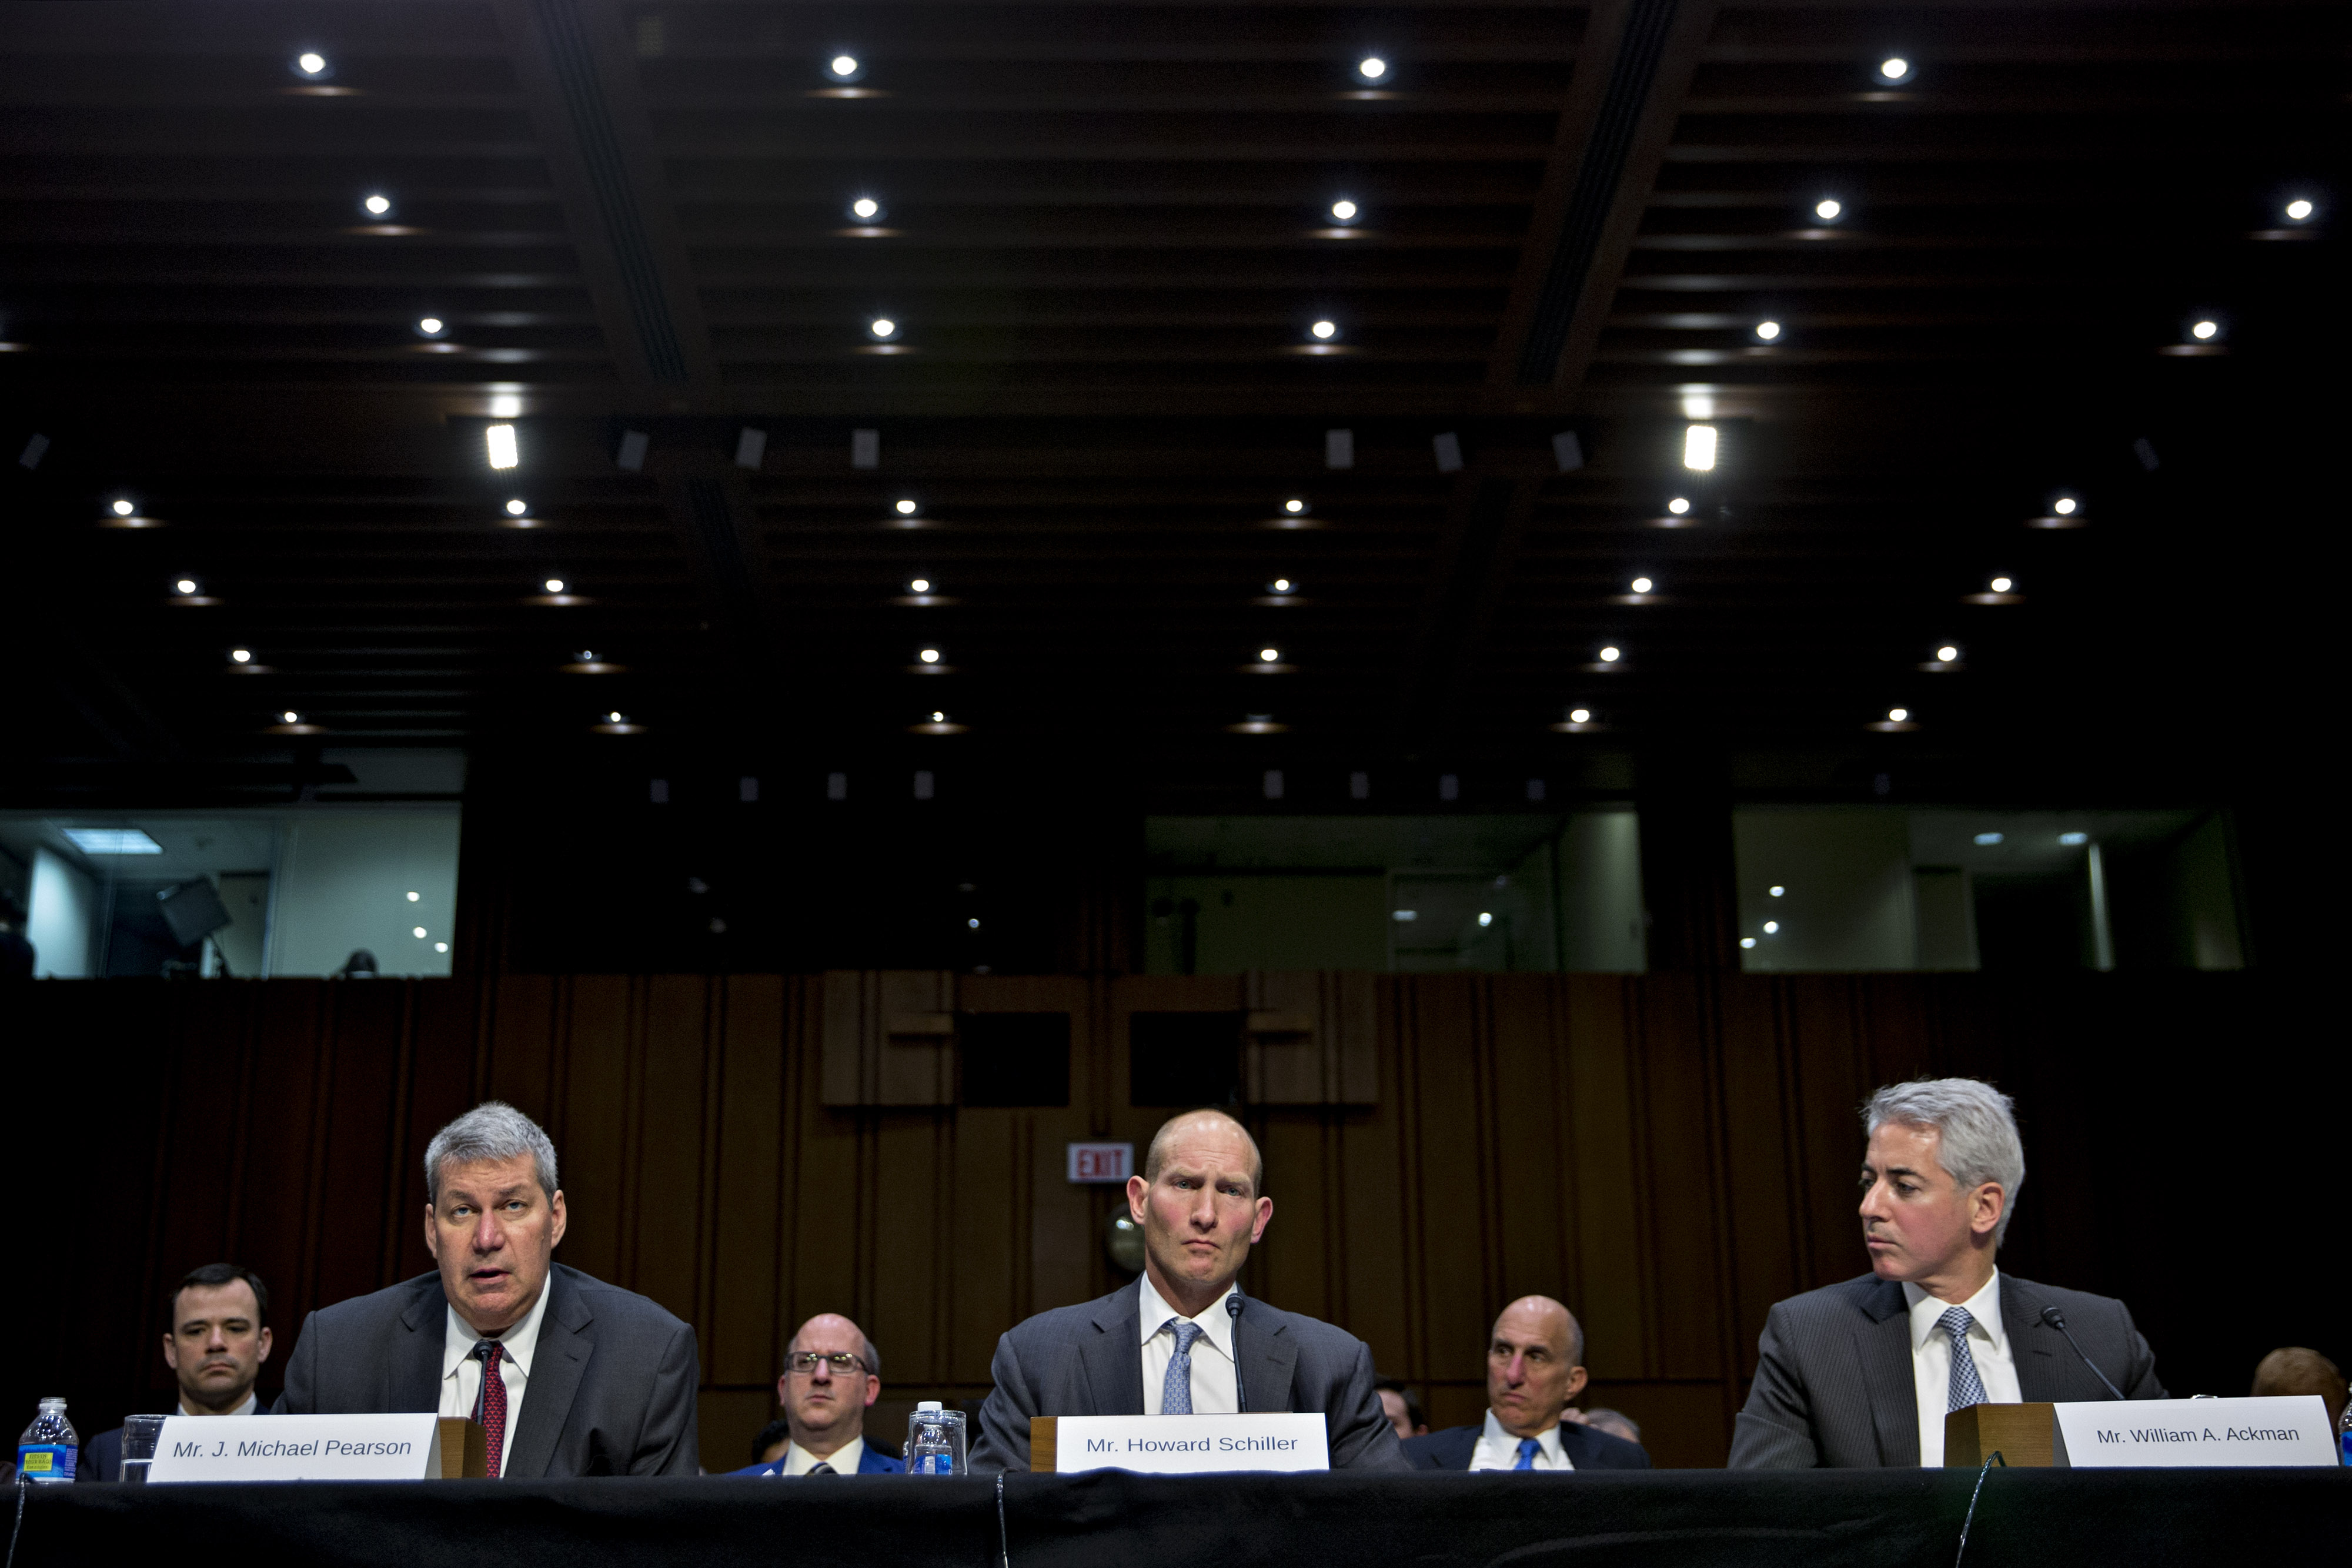 Valeant Pharmaceuticals International Inc. Executives Testify At Senate Hearing On Drug Prices